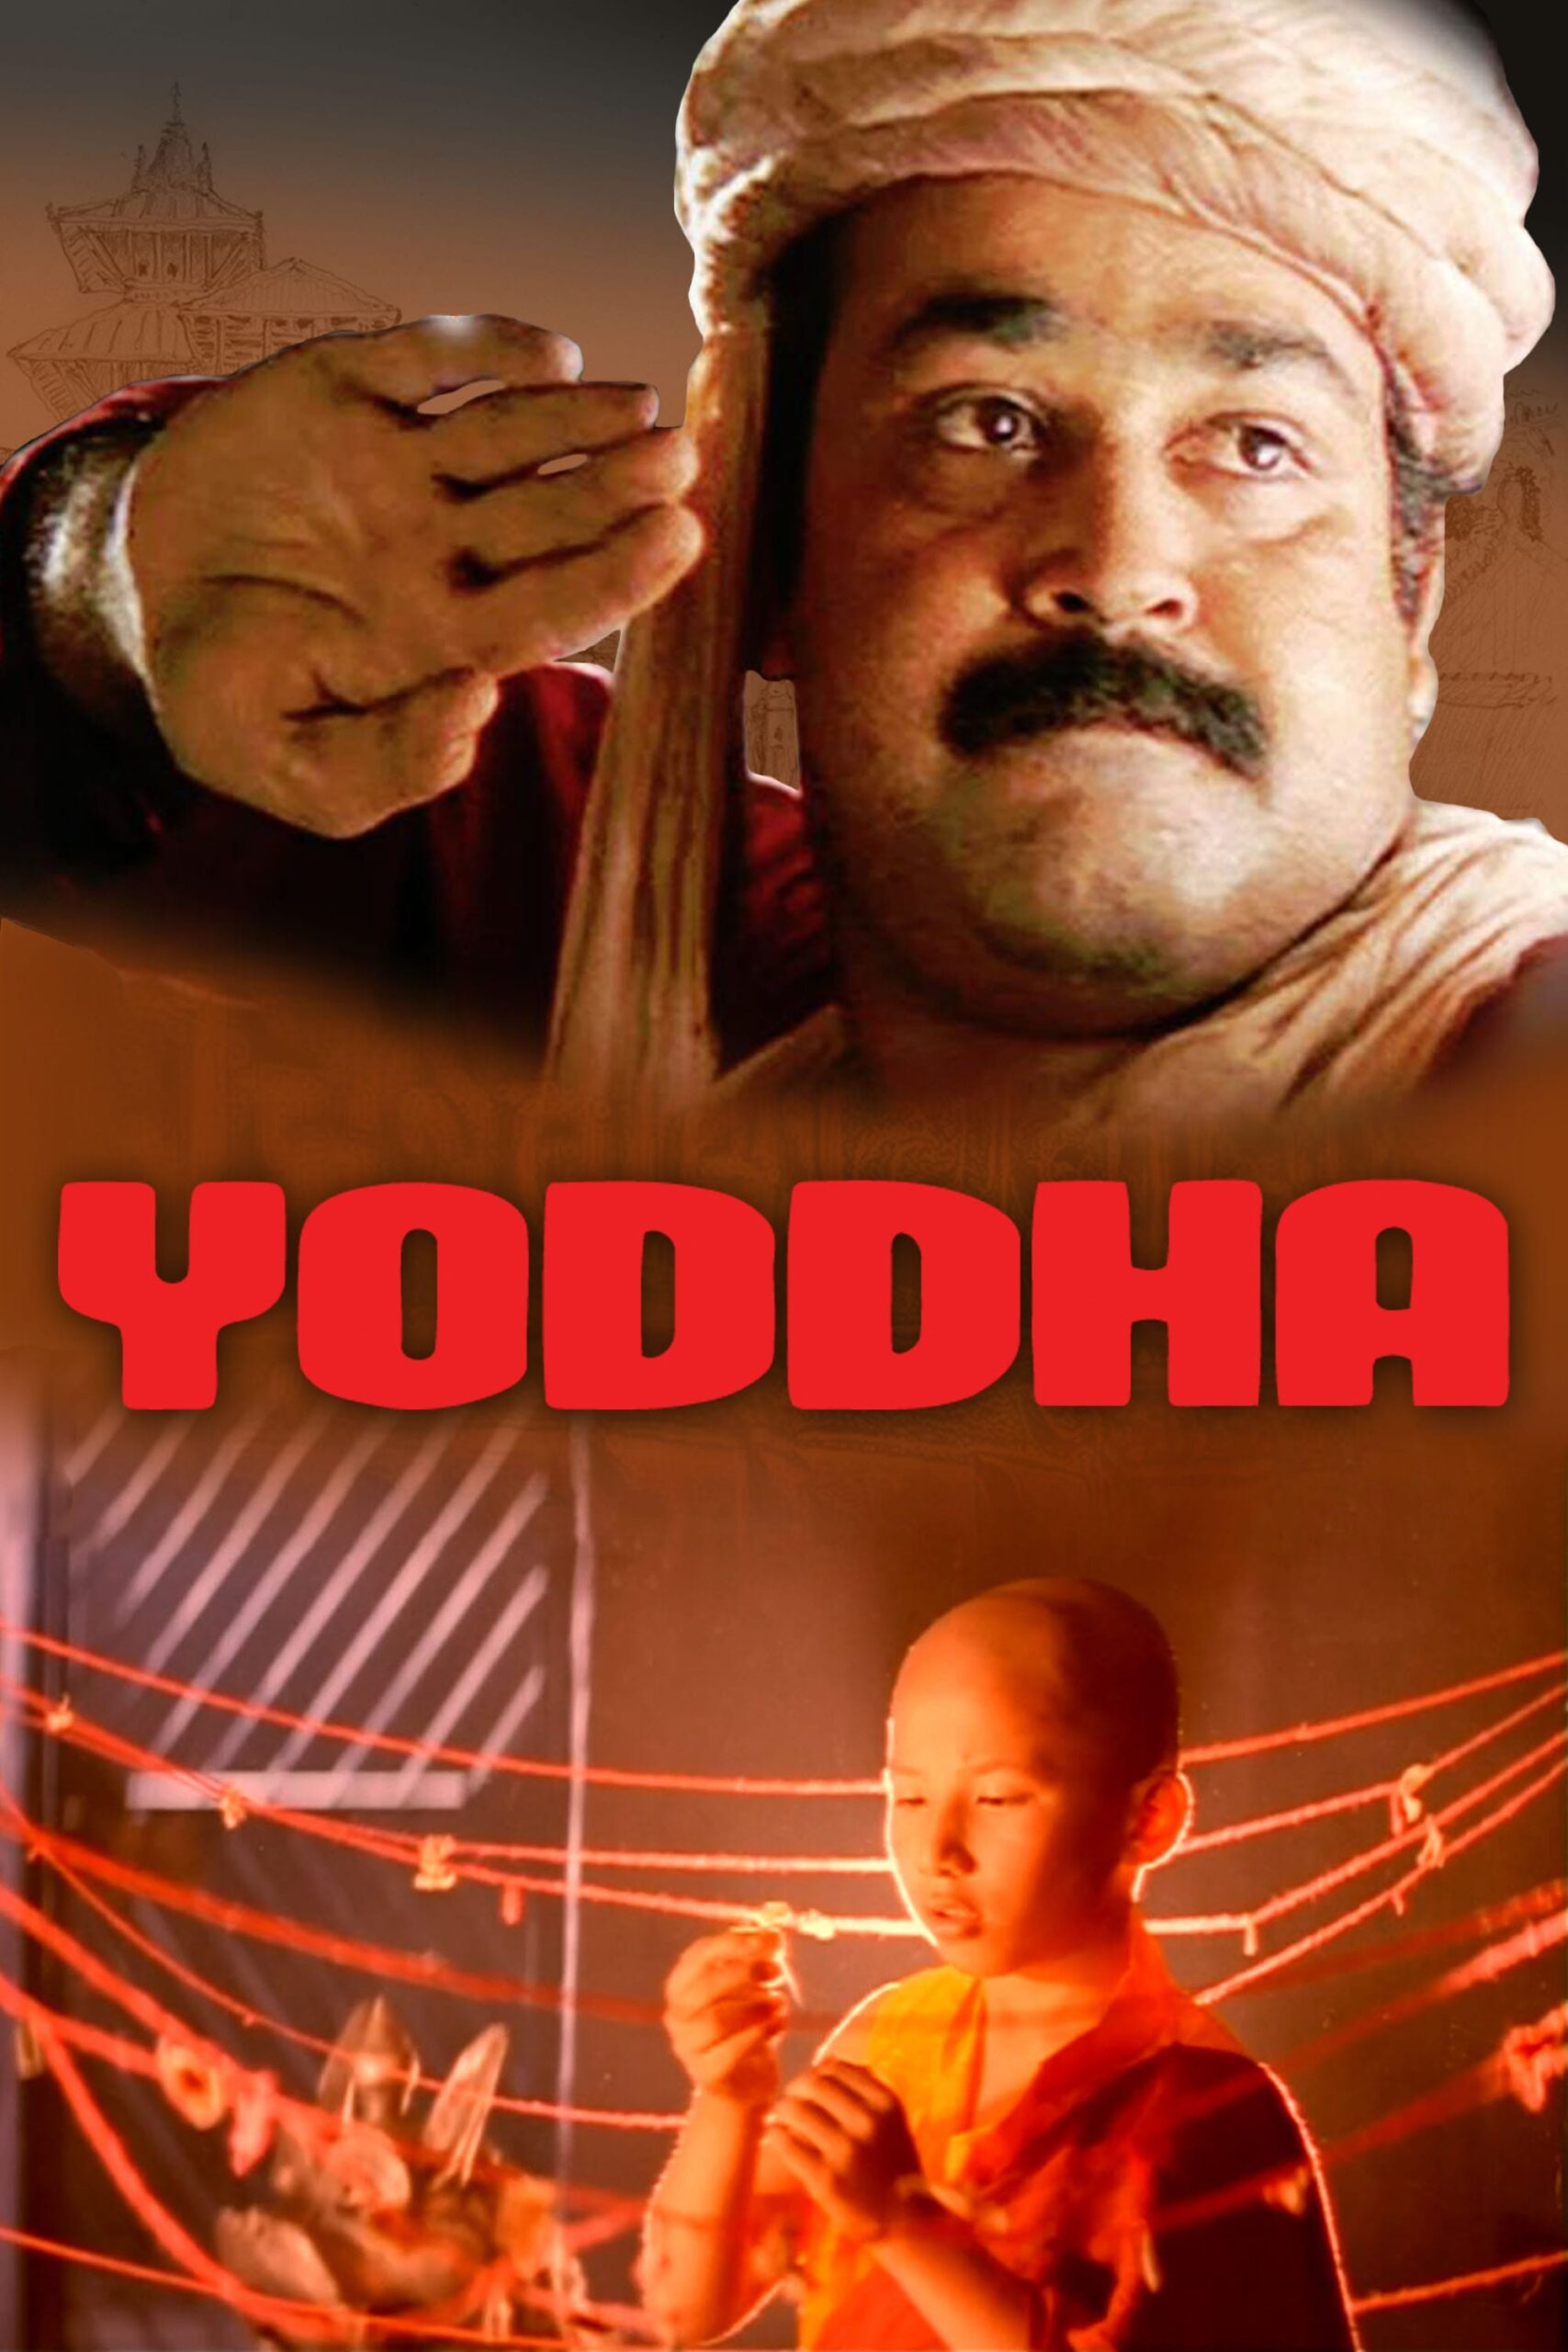 Yoddha Movie Streaming Online Watch on Amazon, Disney Plus Hotstar, ErosNow, Hungama, Jio Cinema, MX Player